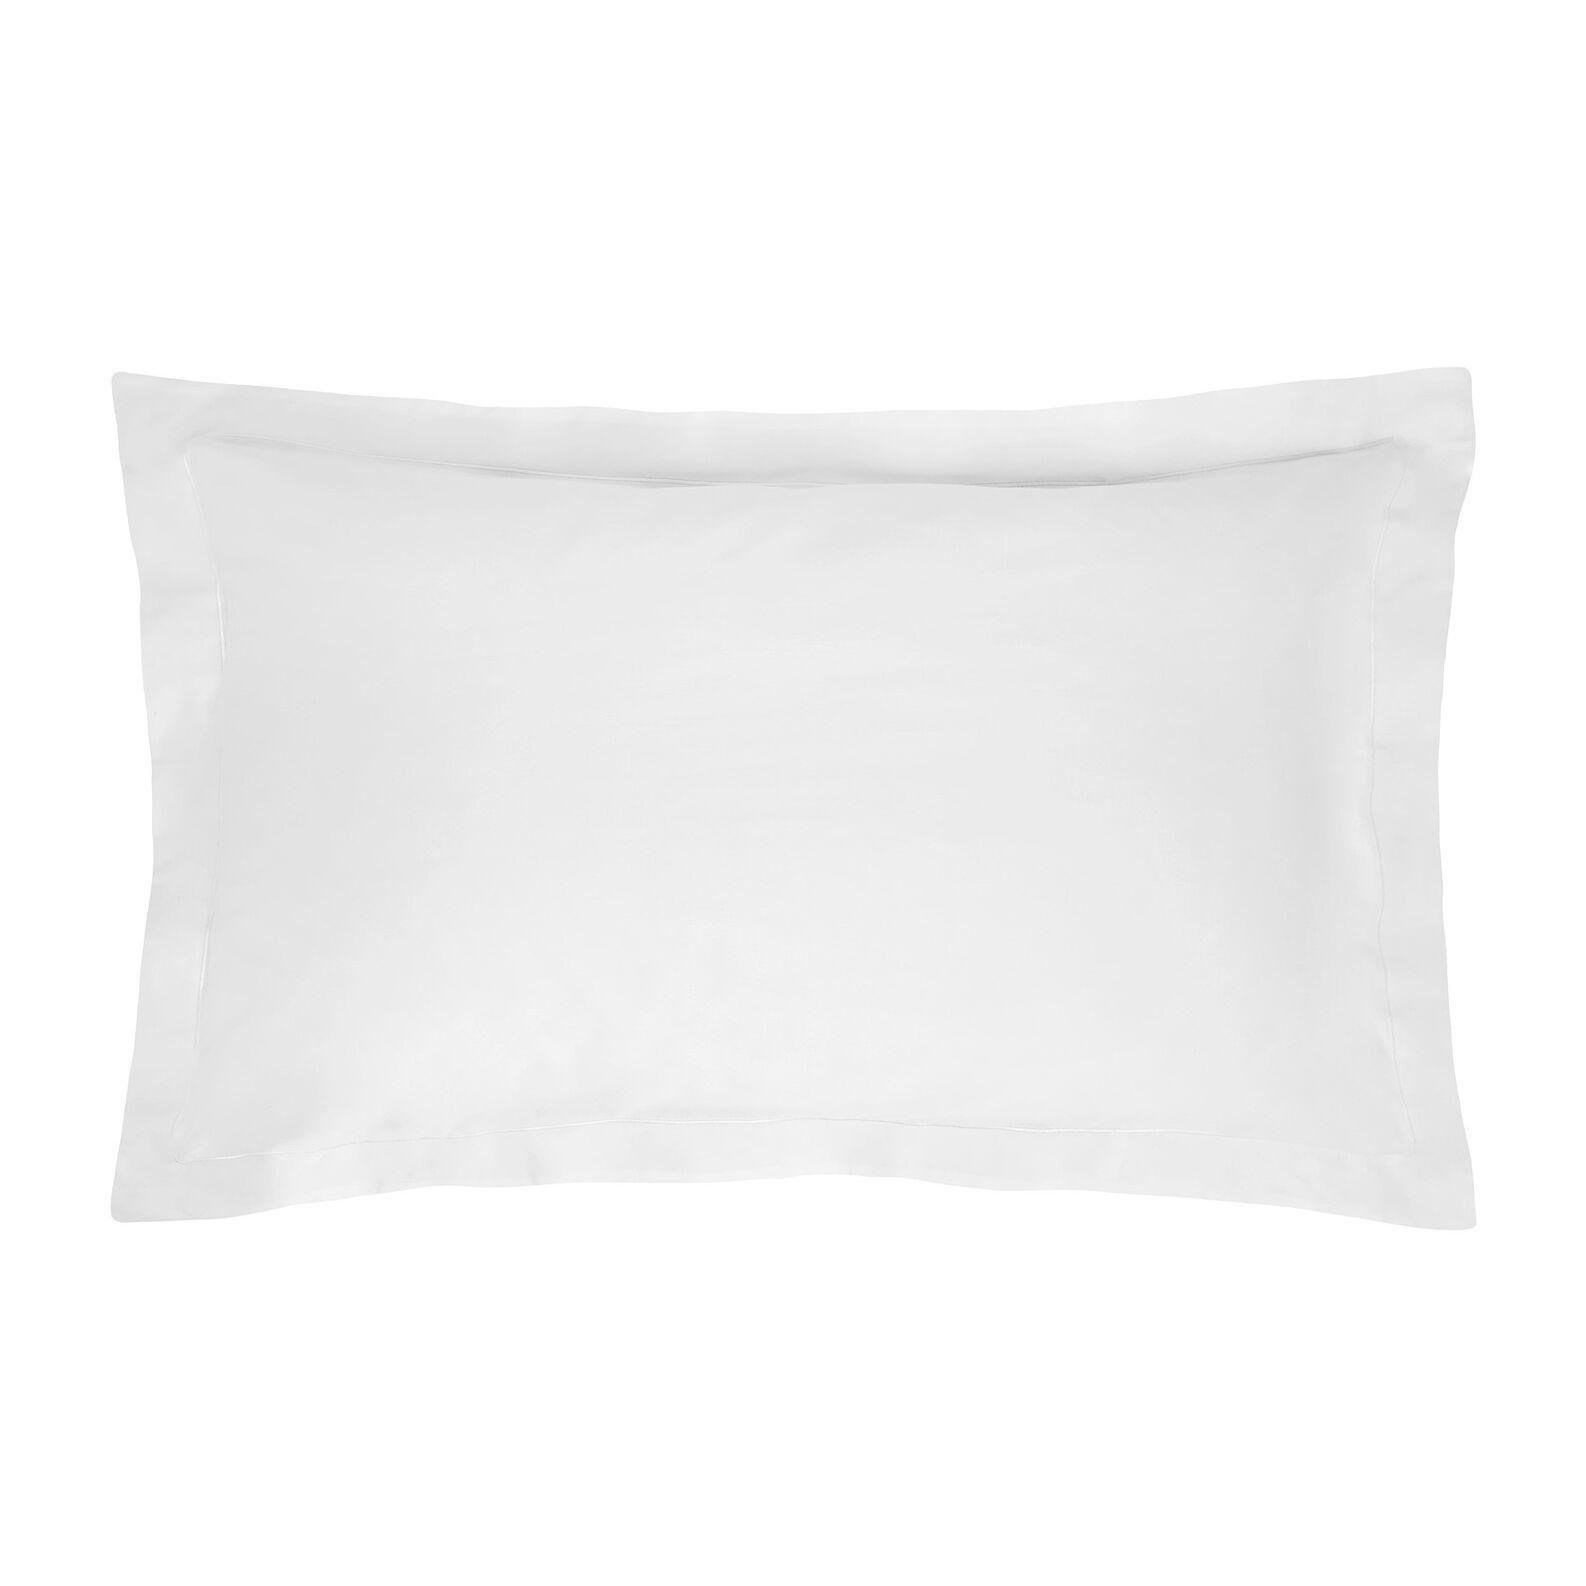 Pillowcase in TC400 satin cotton